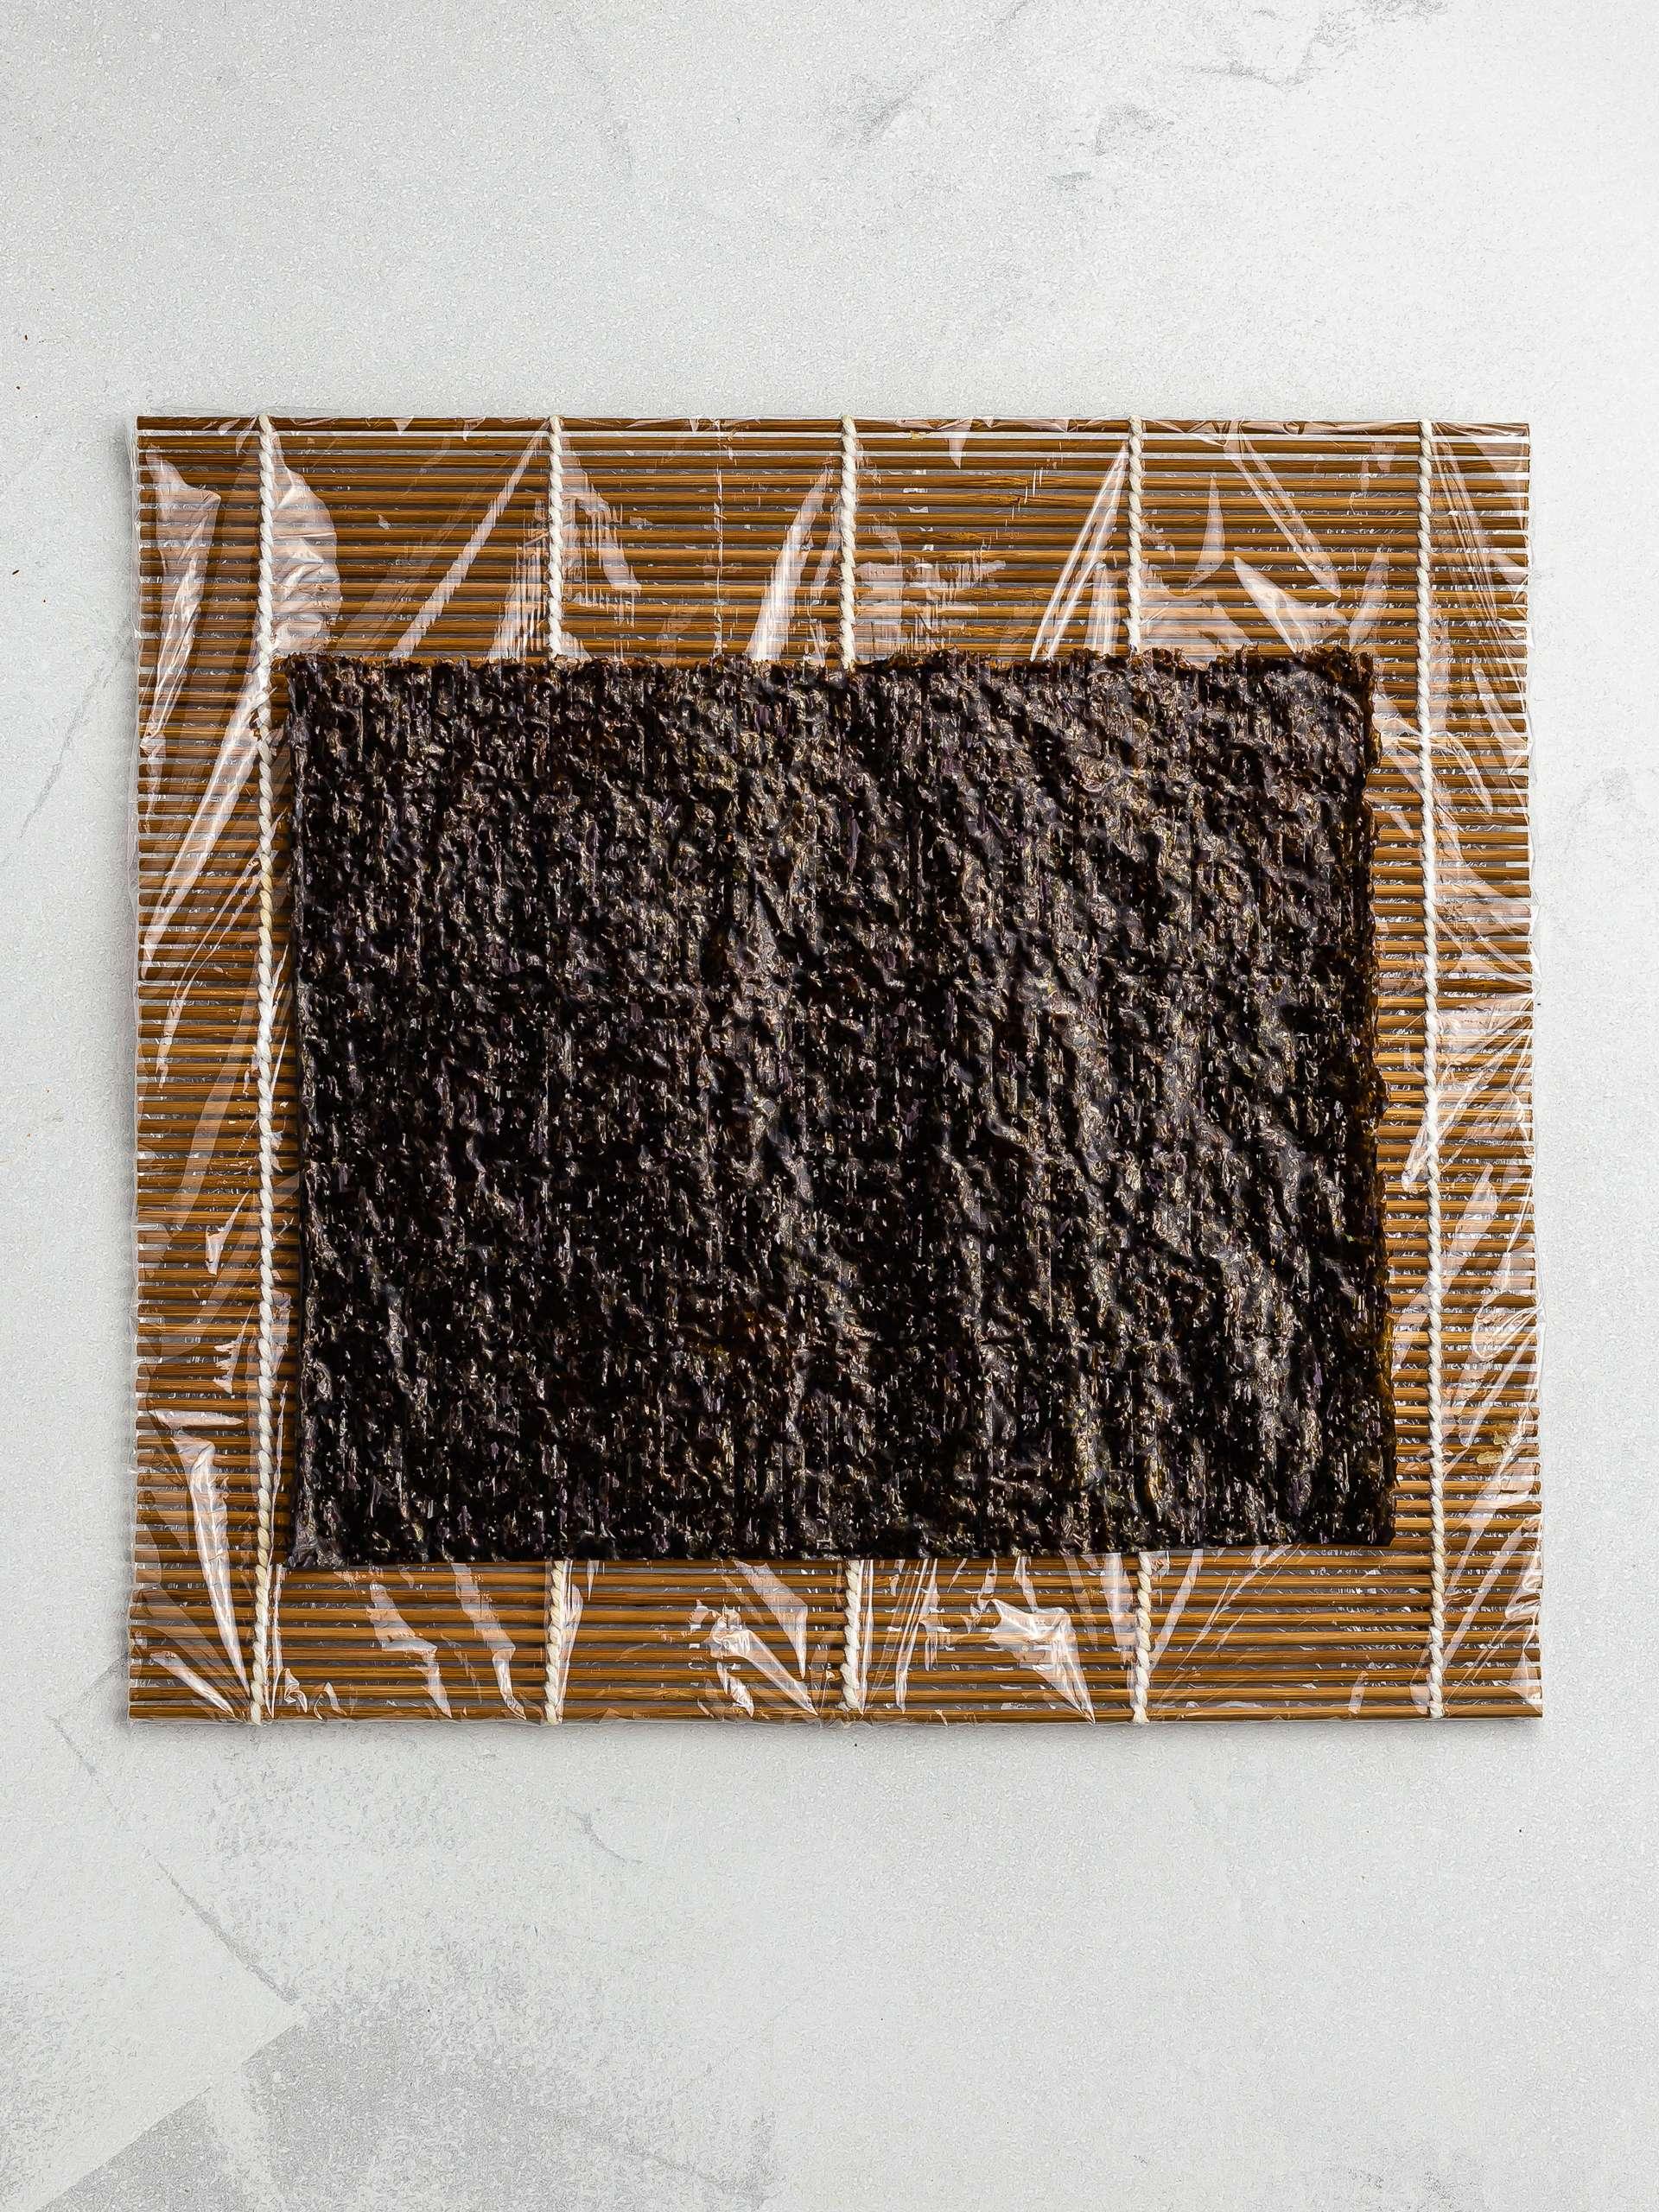 bamboo mat lined with nori sheet